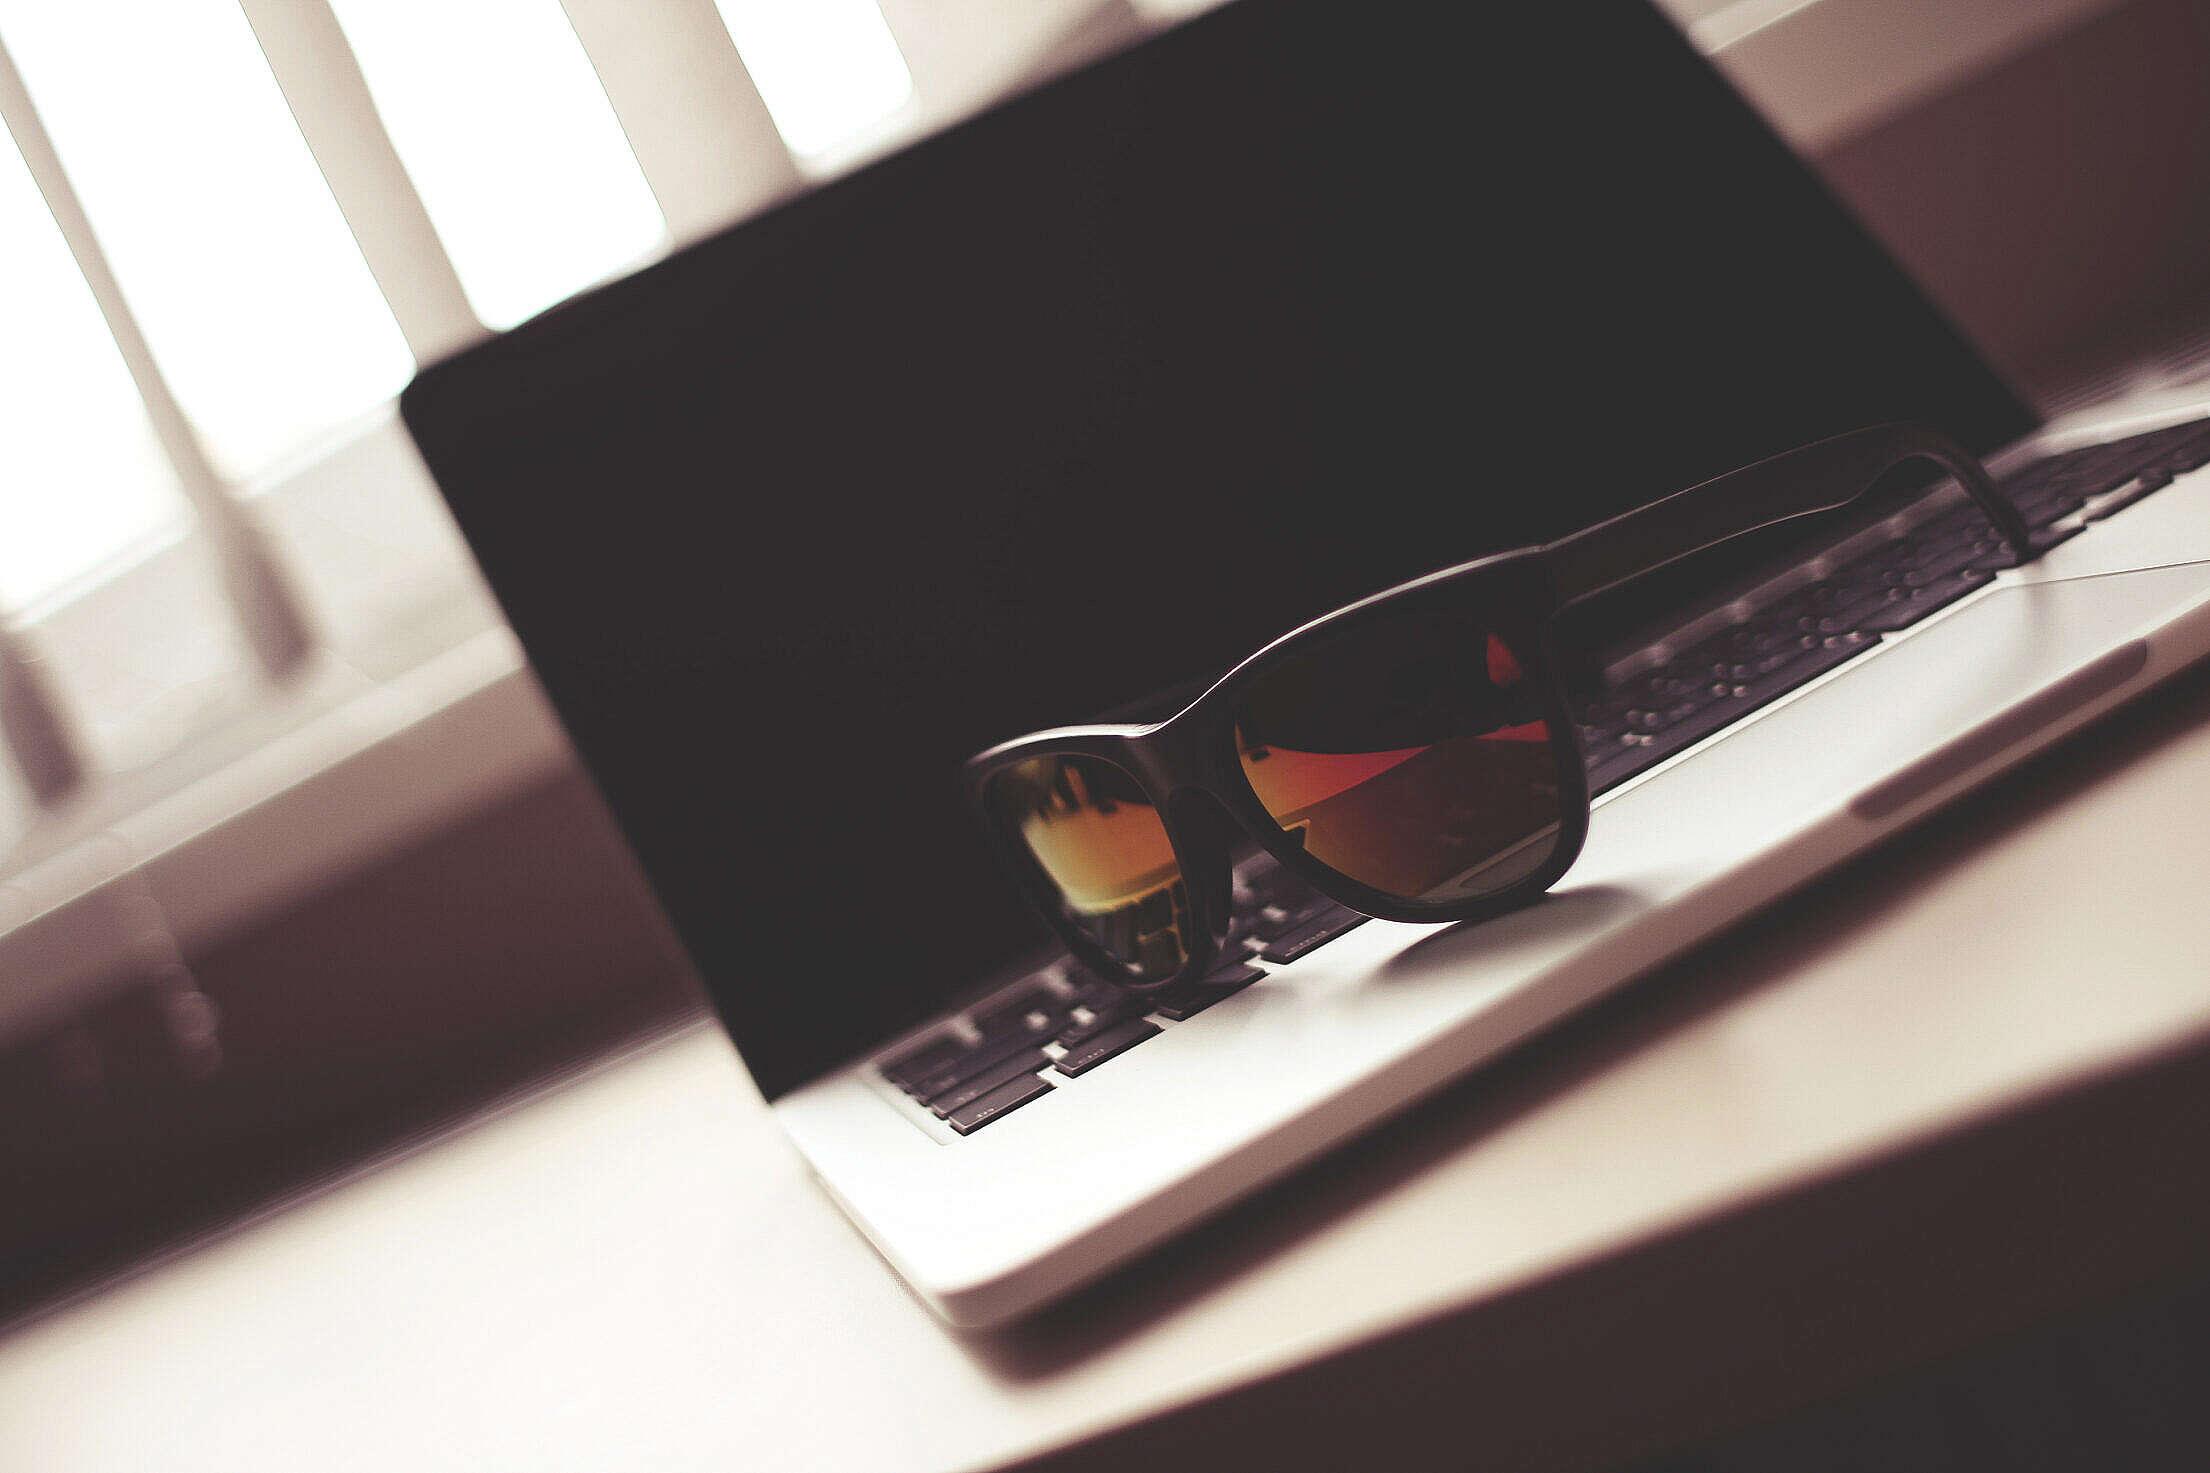 Fashion Sunglasses on a MacBook Free Stock Photo